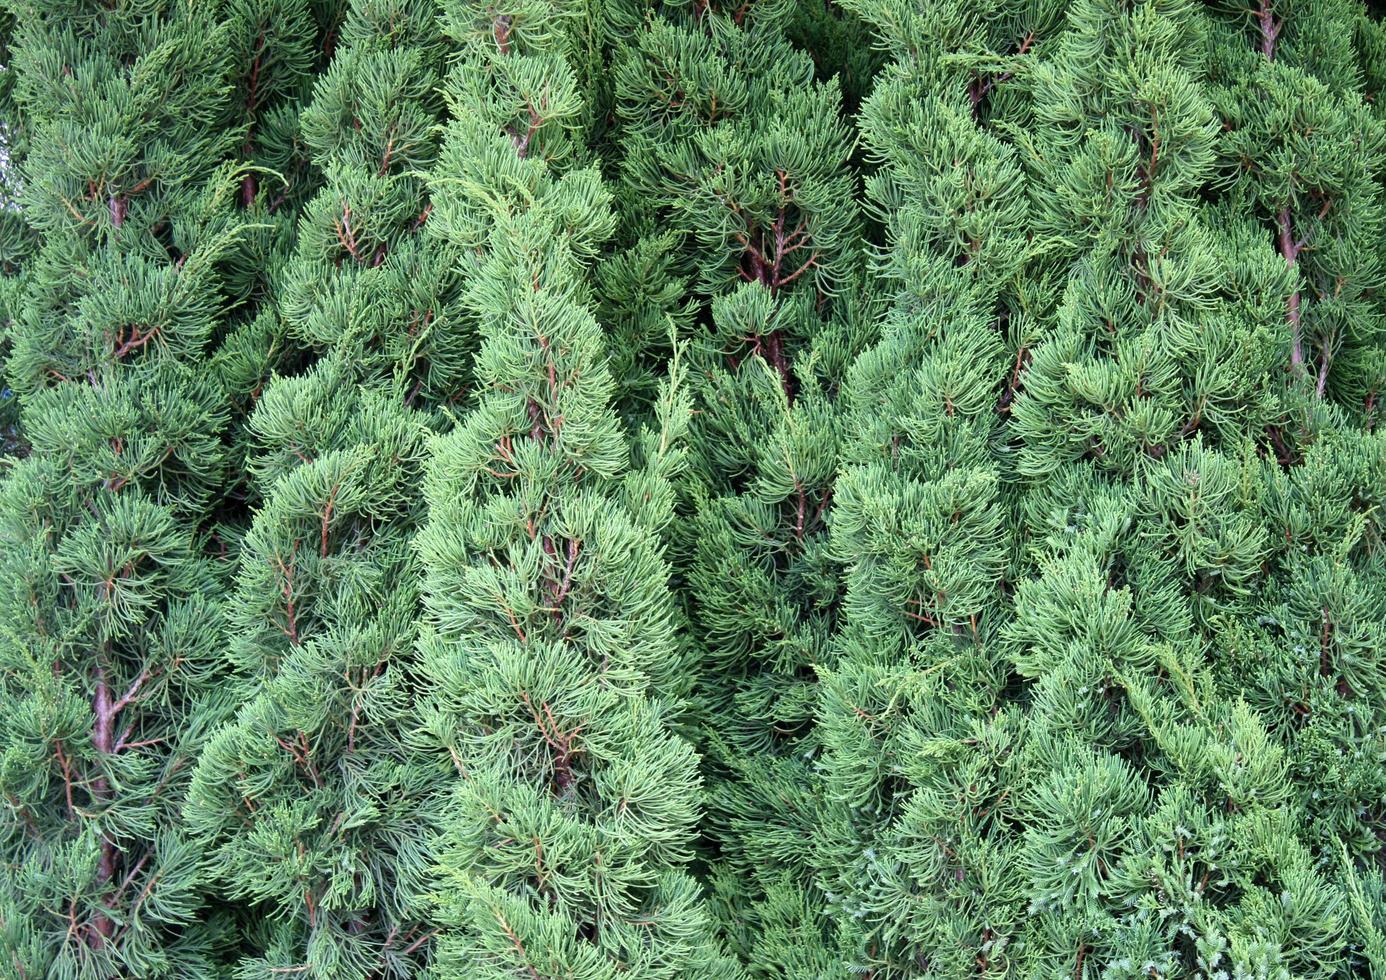 planta verde de hoja perenne foto